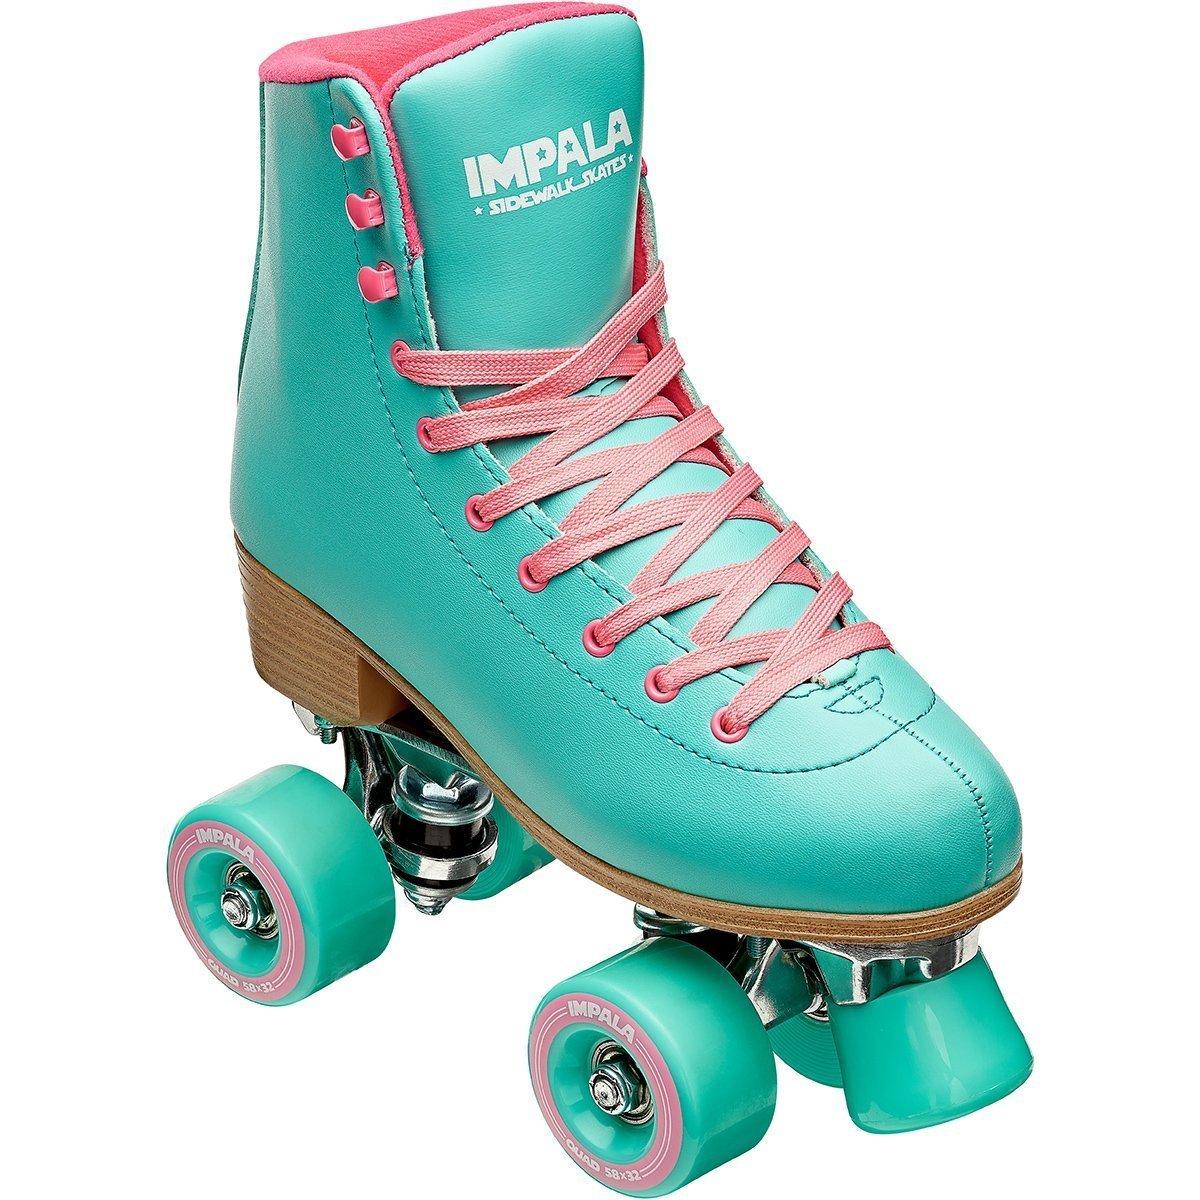 Impala Rollerskates - Aqua